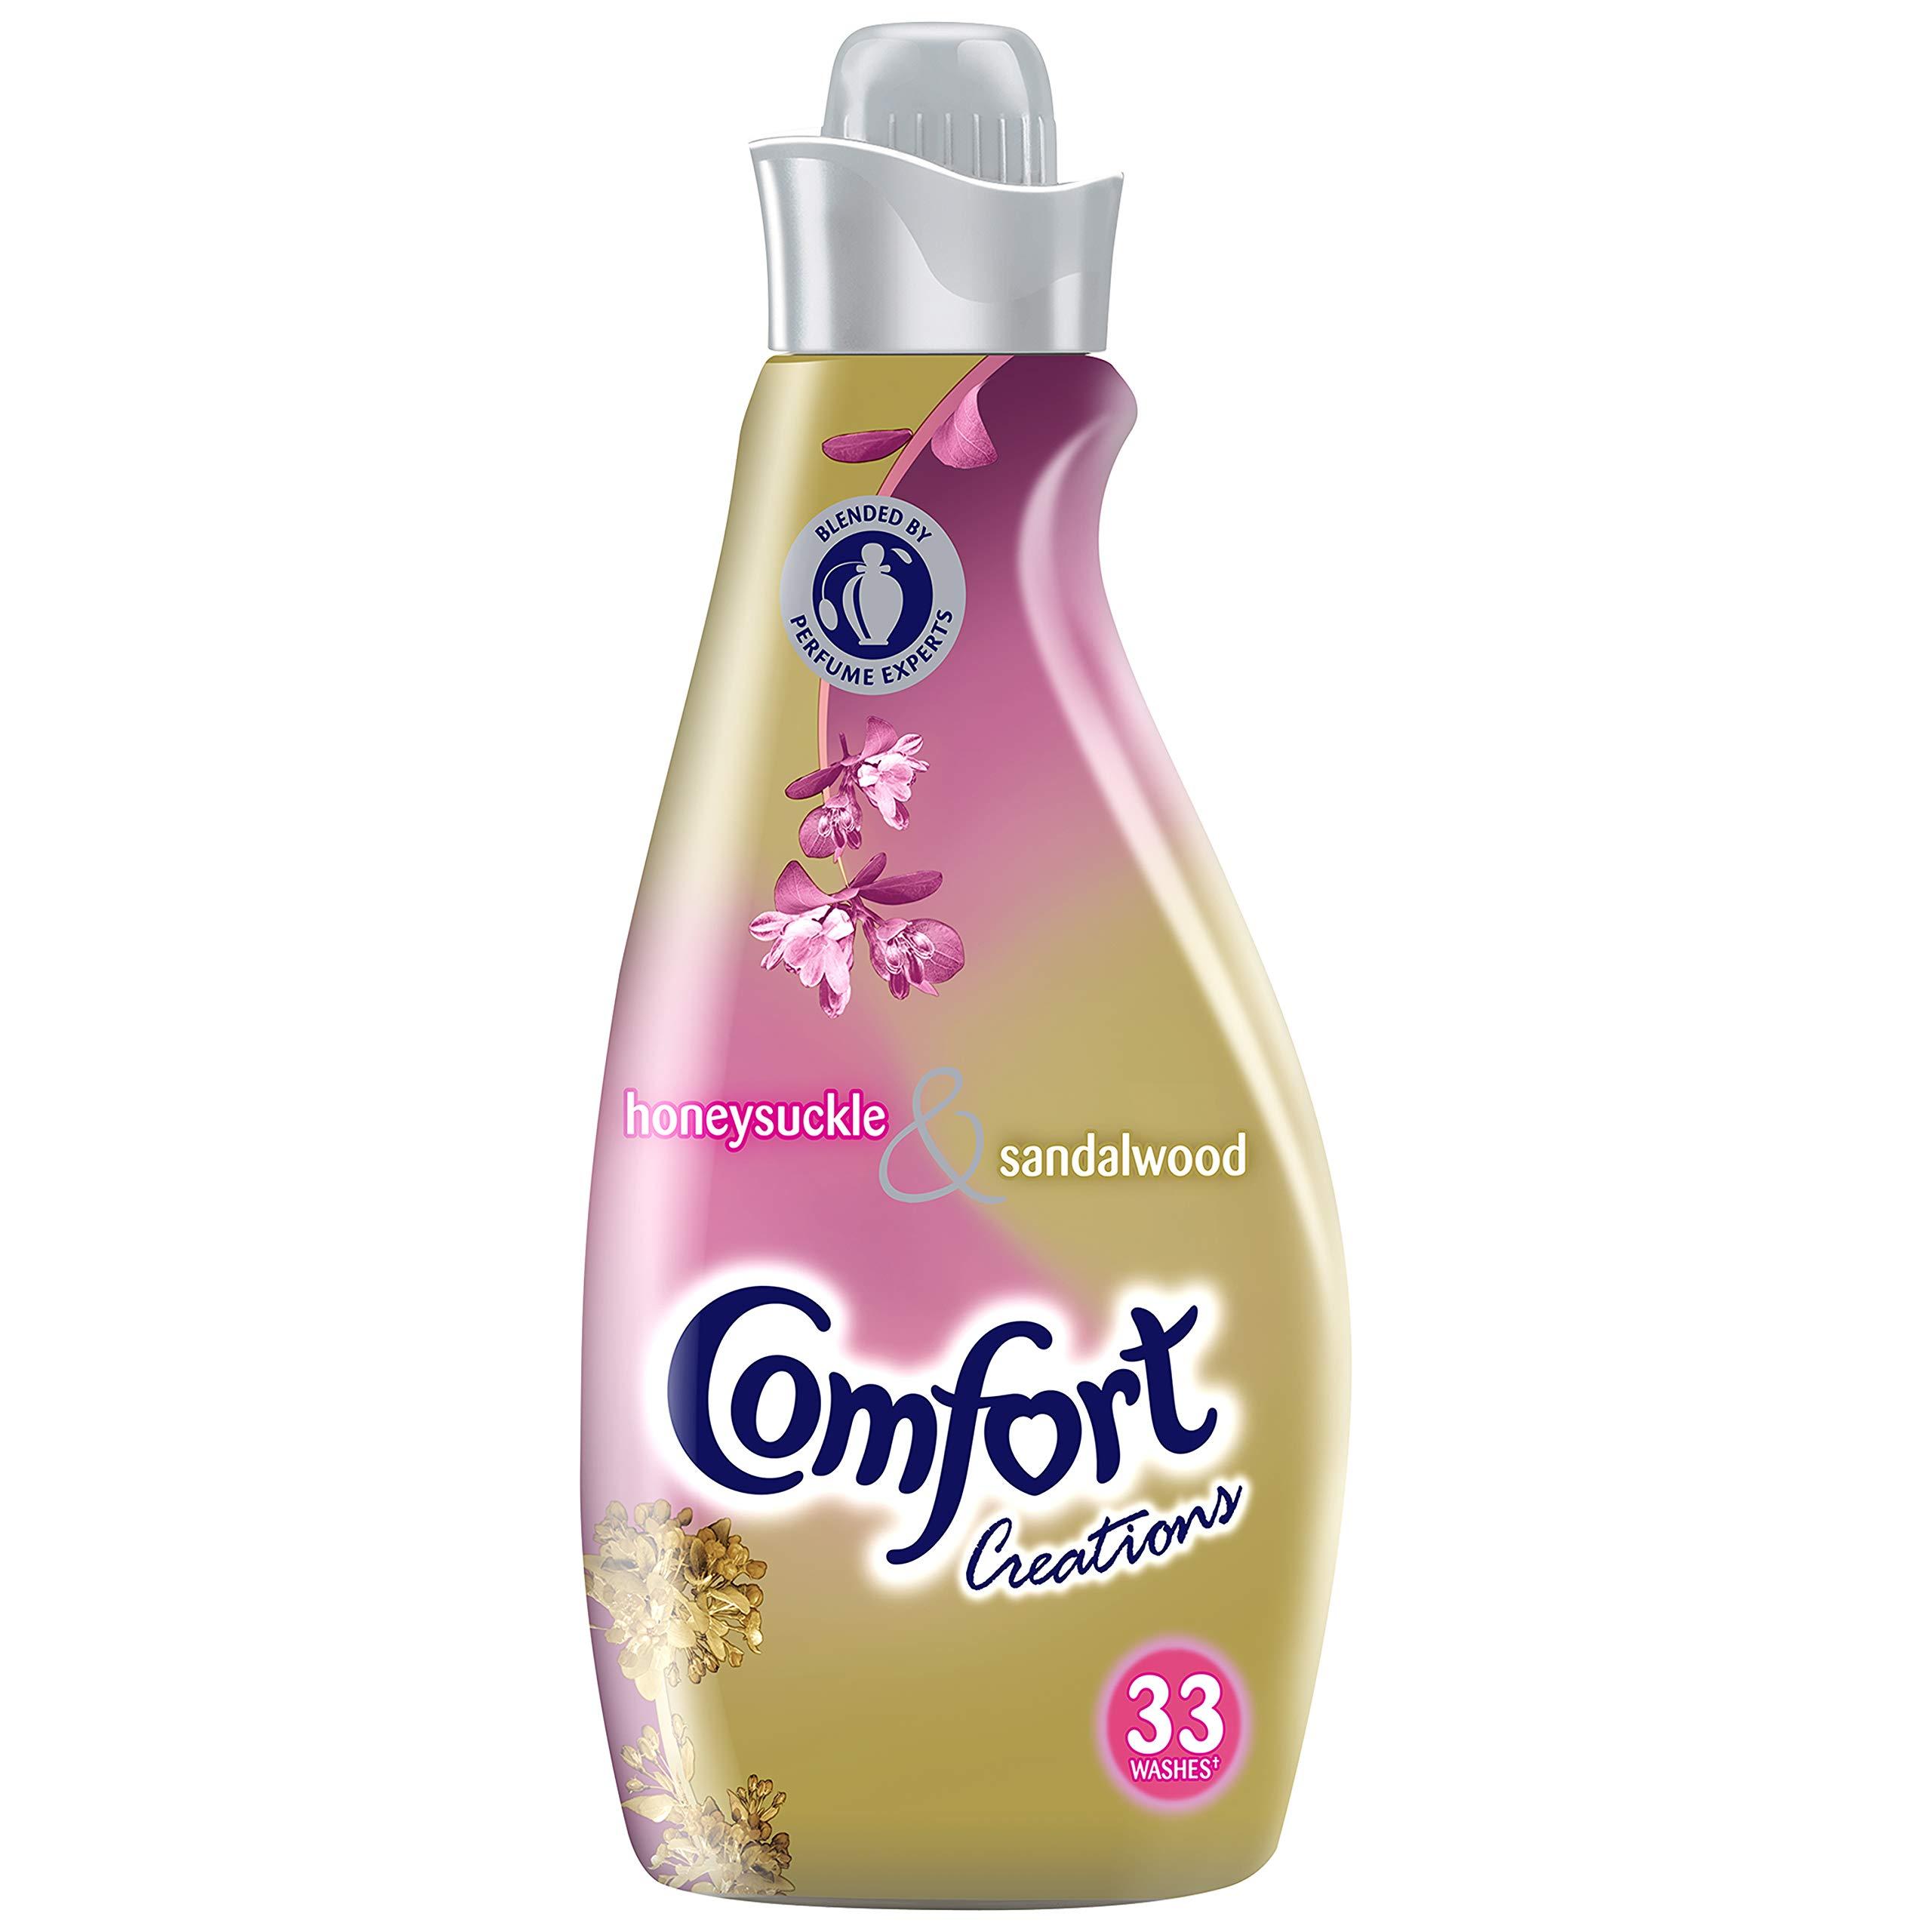 Comfort Creations Honeysuckle & Sandalwood, Pack of 6 ((33w))